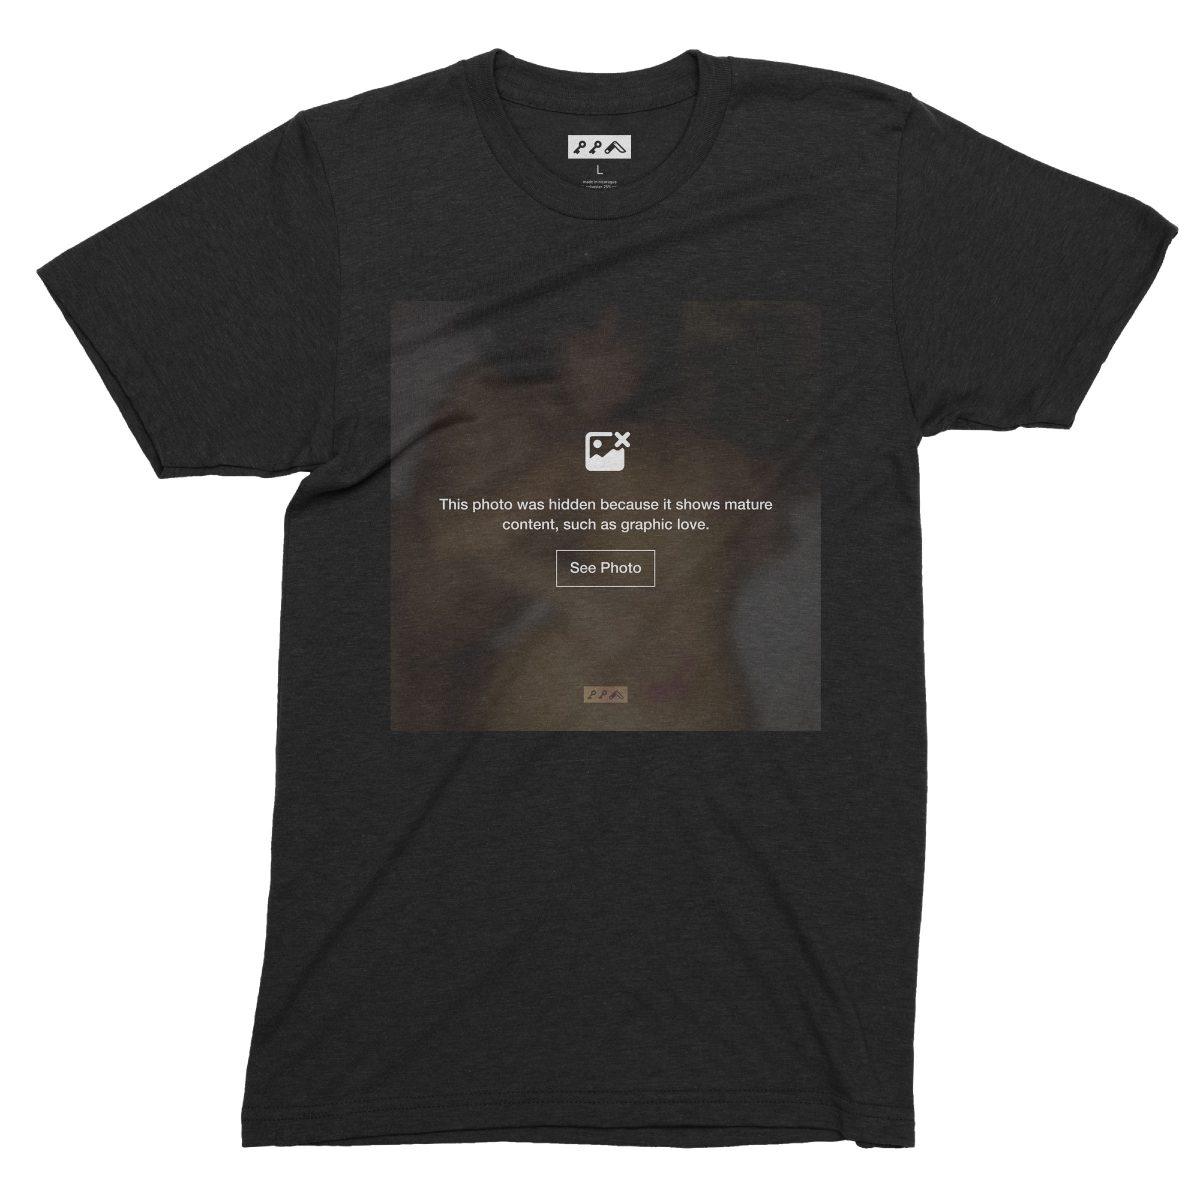 """GRAPHIC LOVE"" hidden sex image t-shirts in black by kikicutt"